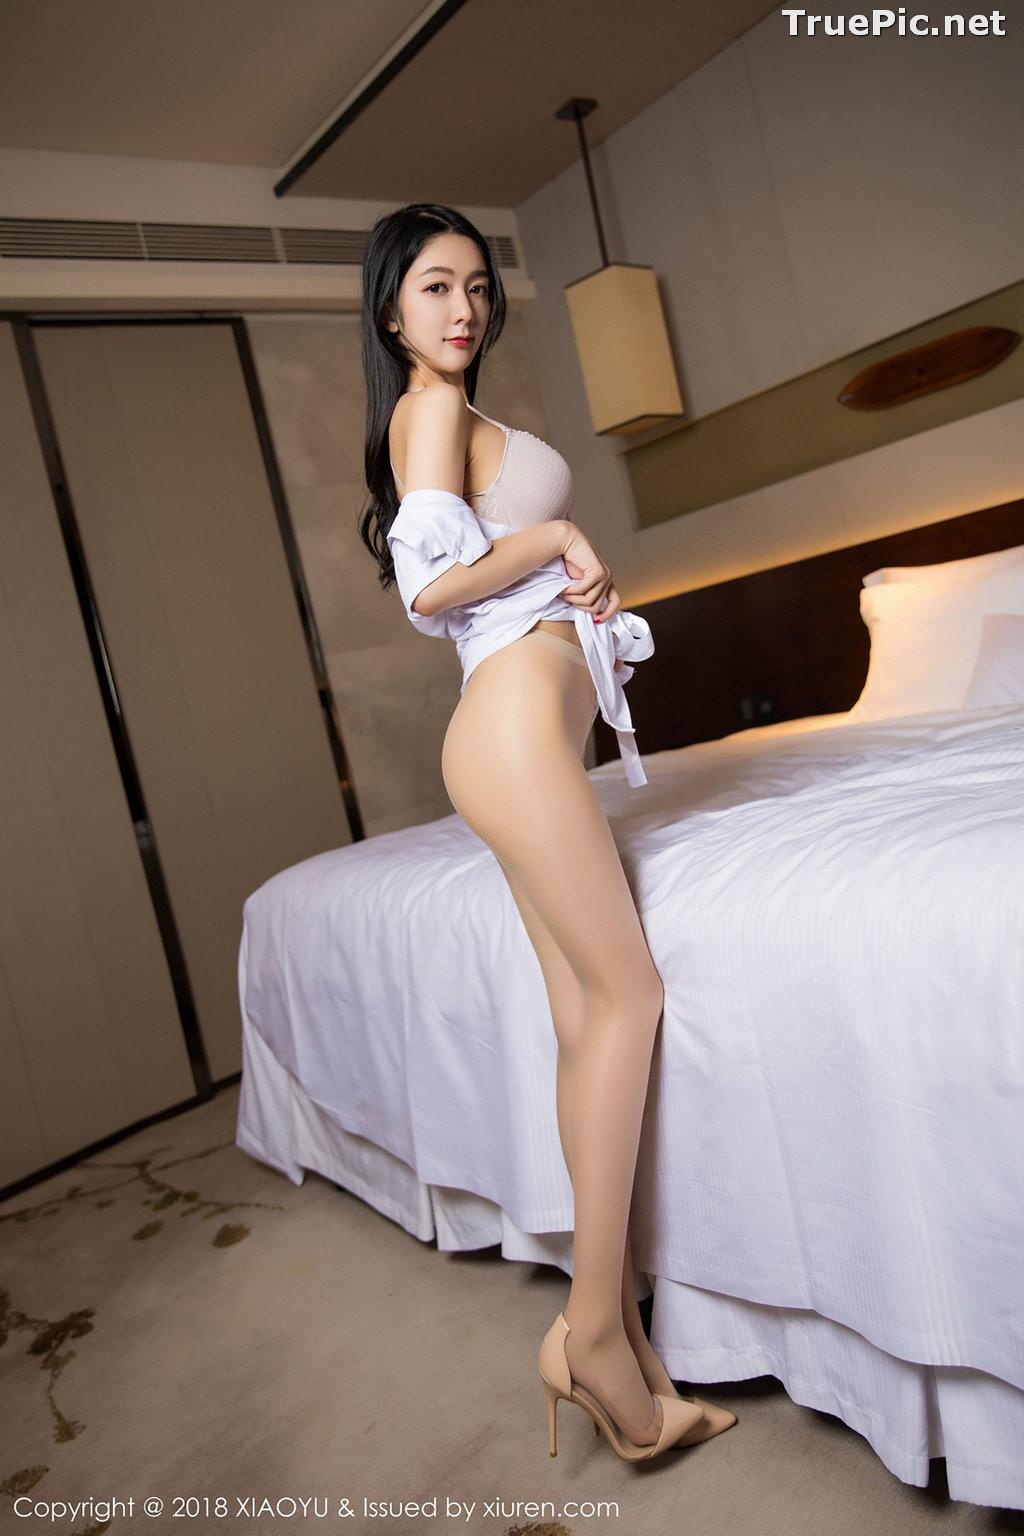 Image XiaoYu No.004 - Chinese Model - Xiao Reba (Angela喜欢猫) - White Sexy Nurse - TruePic.net - Picture-32